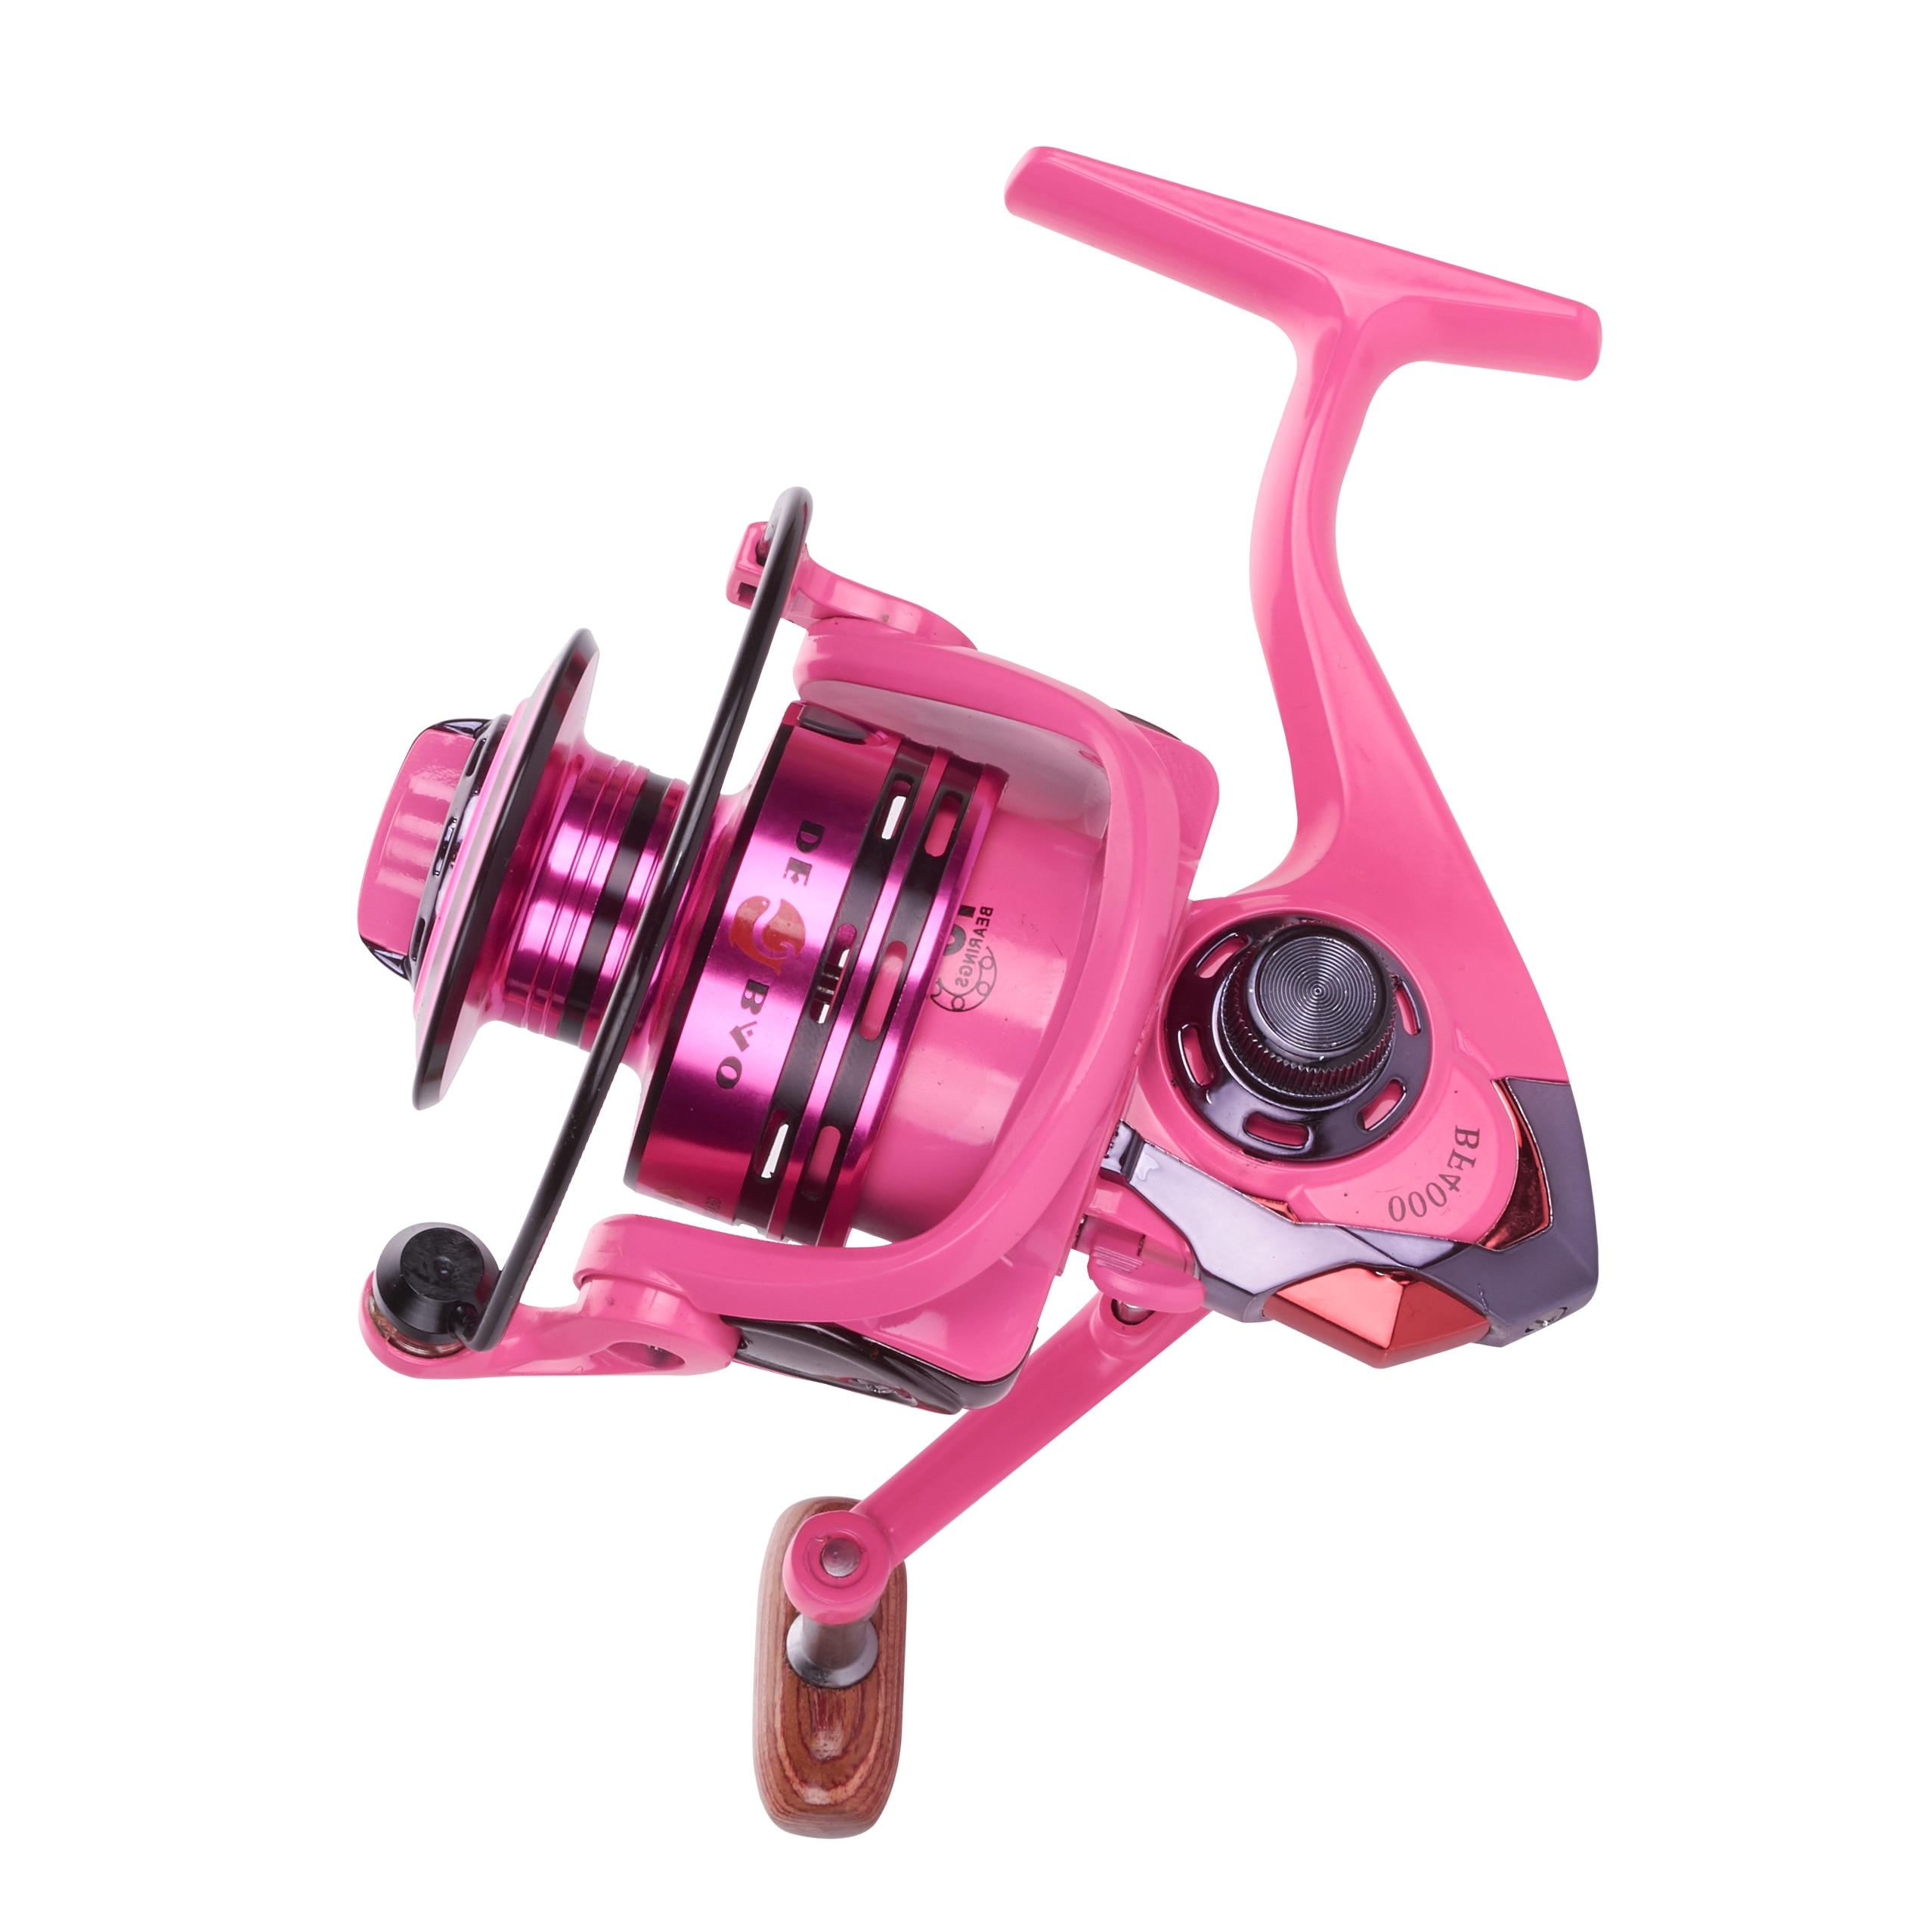 HiUmi Pink/Green 10+1 BB Ratio 5.2:1 Metal Spinning Fishing Reel 2000 3000 4000 5000 Fishing Gear For Freshwater Fishing Pesca